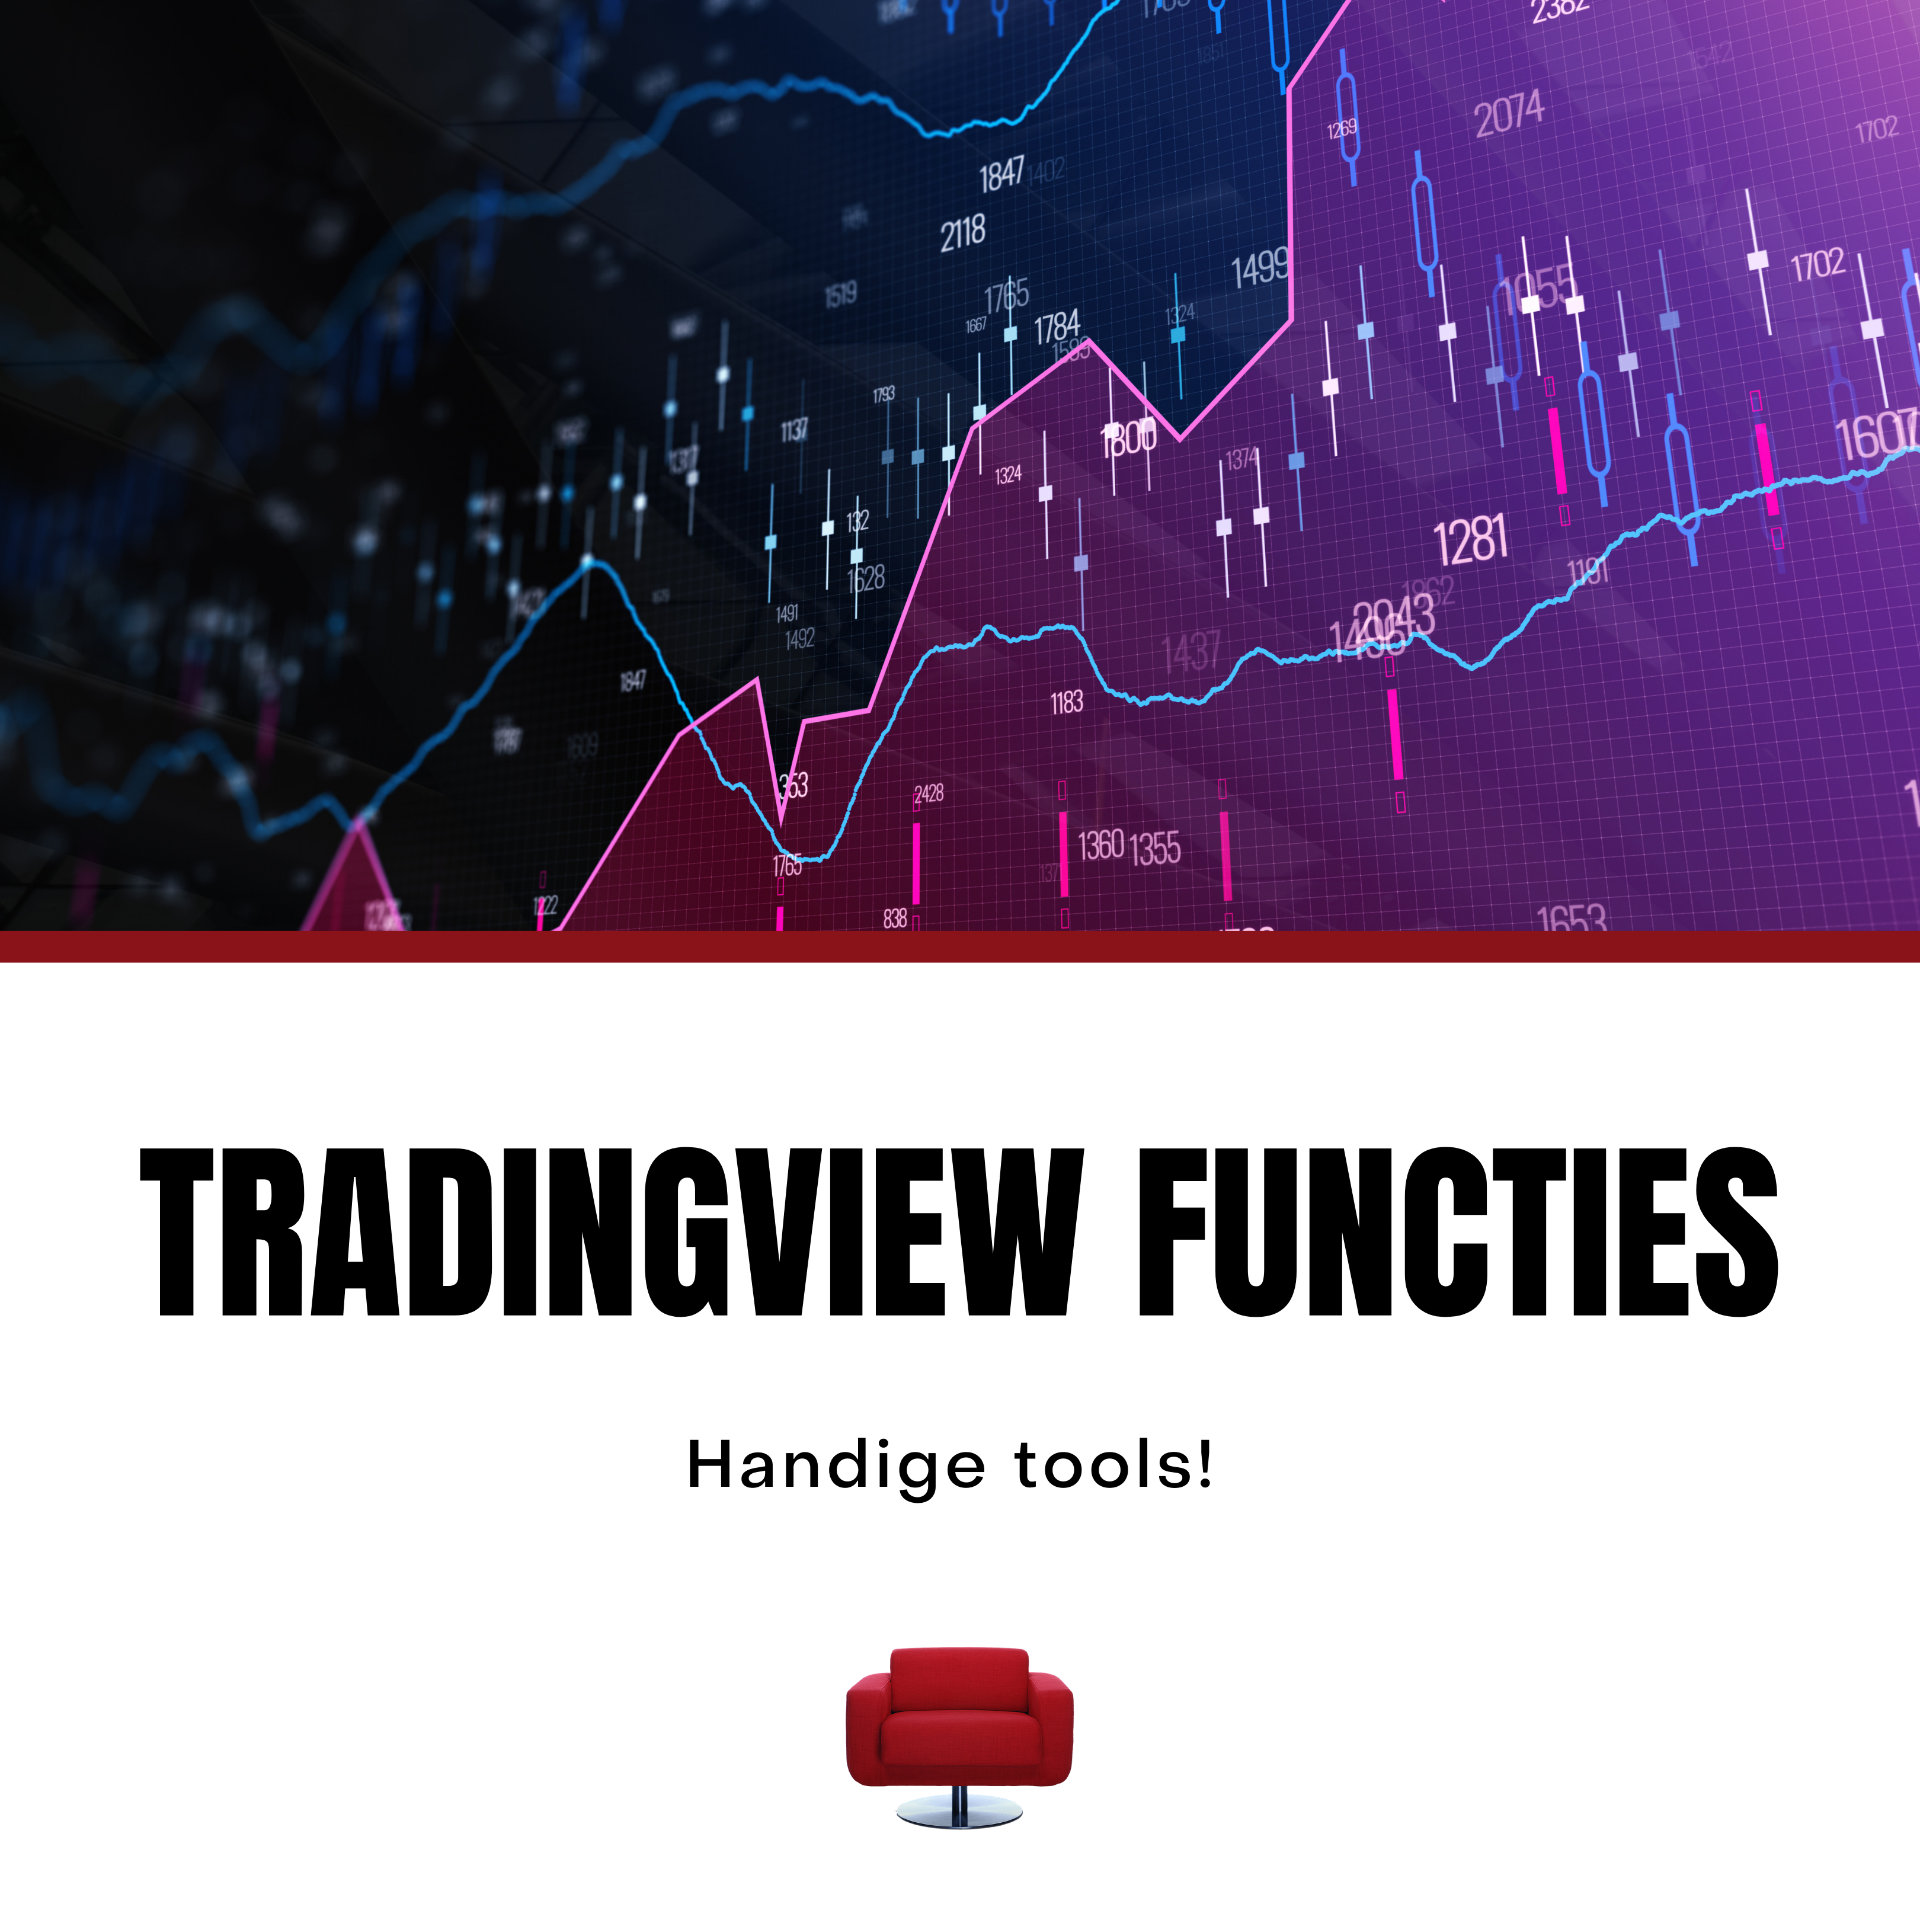 tradingview functies instagram beleggingsinstituut